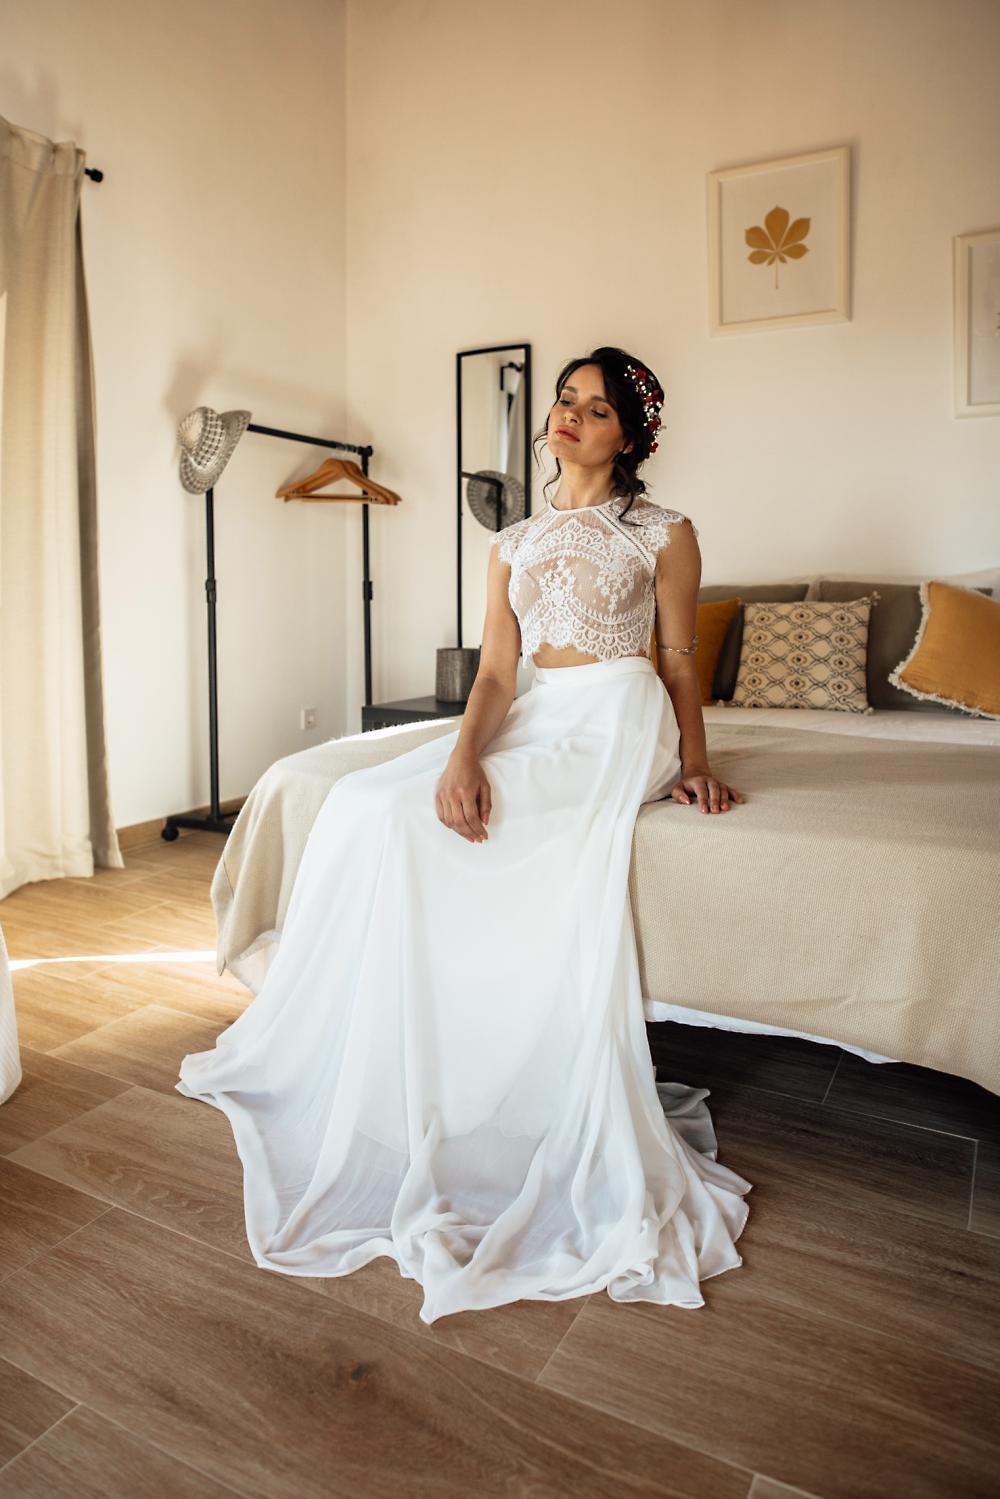 komorebi-Hochzeitsfotograf-70_WEB.jpg